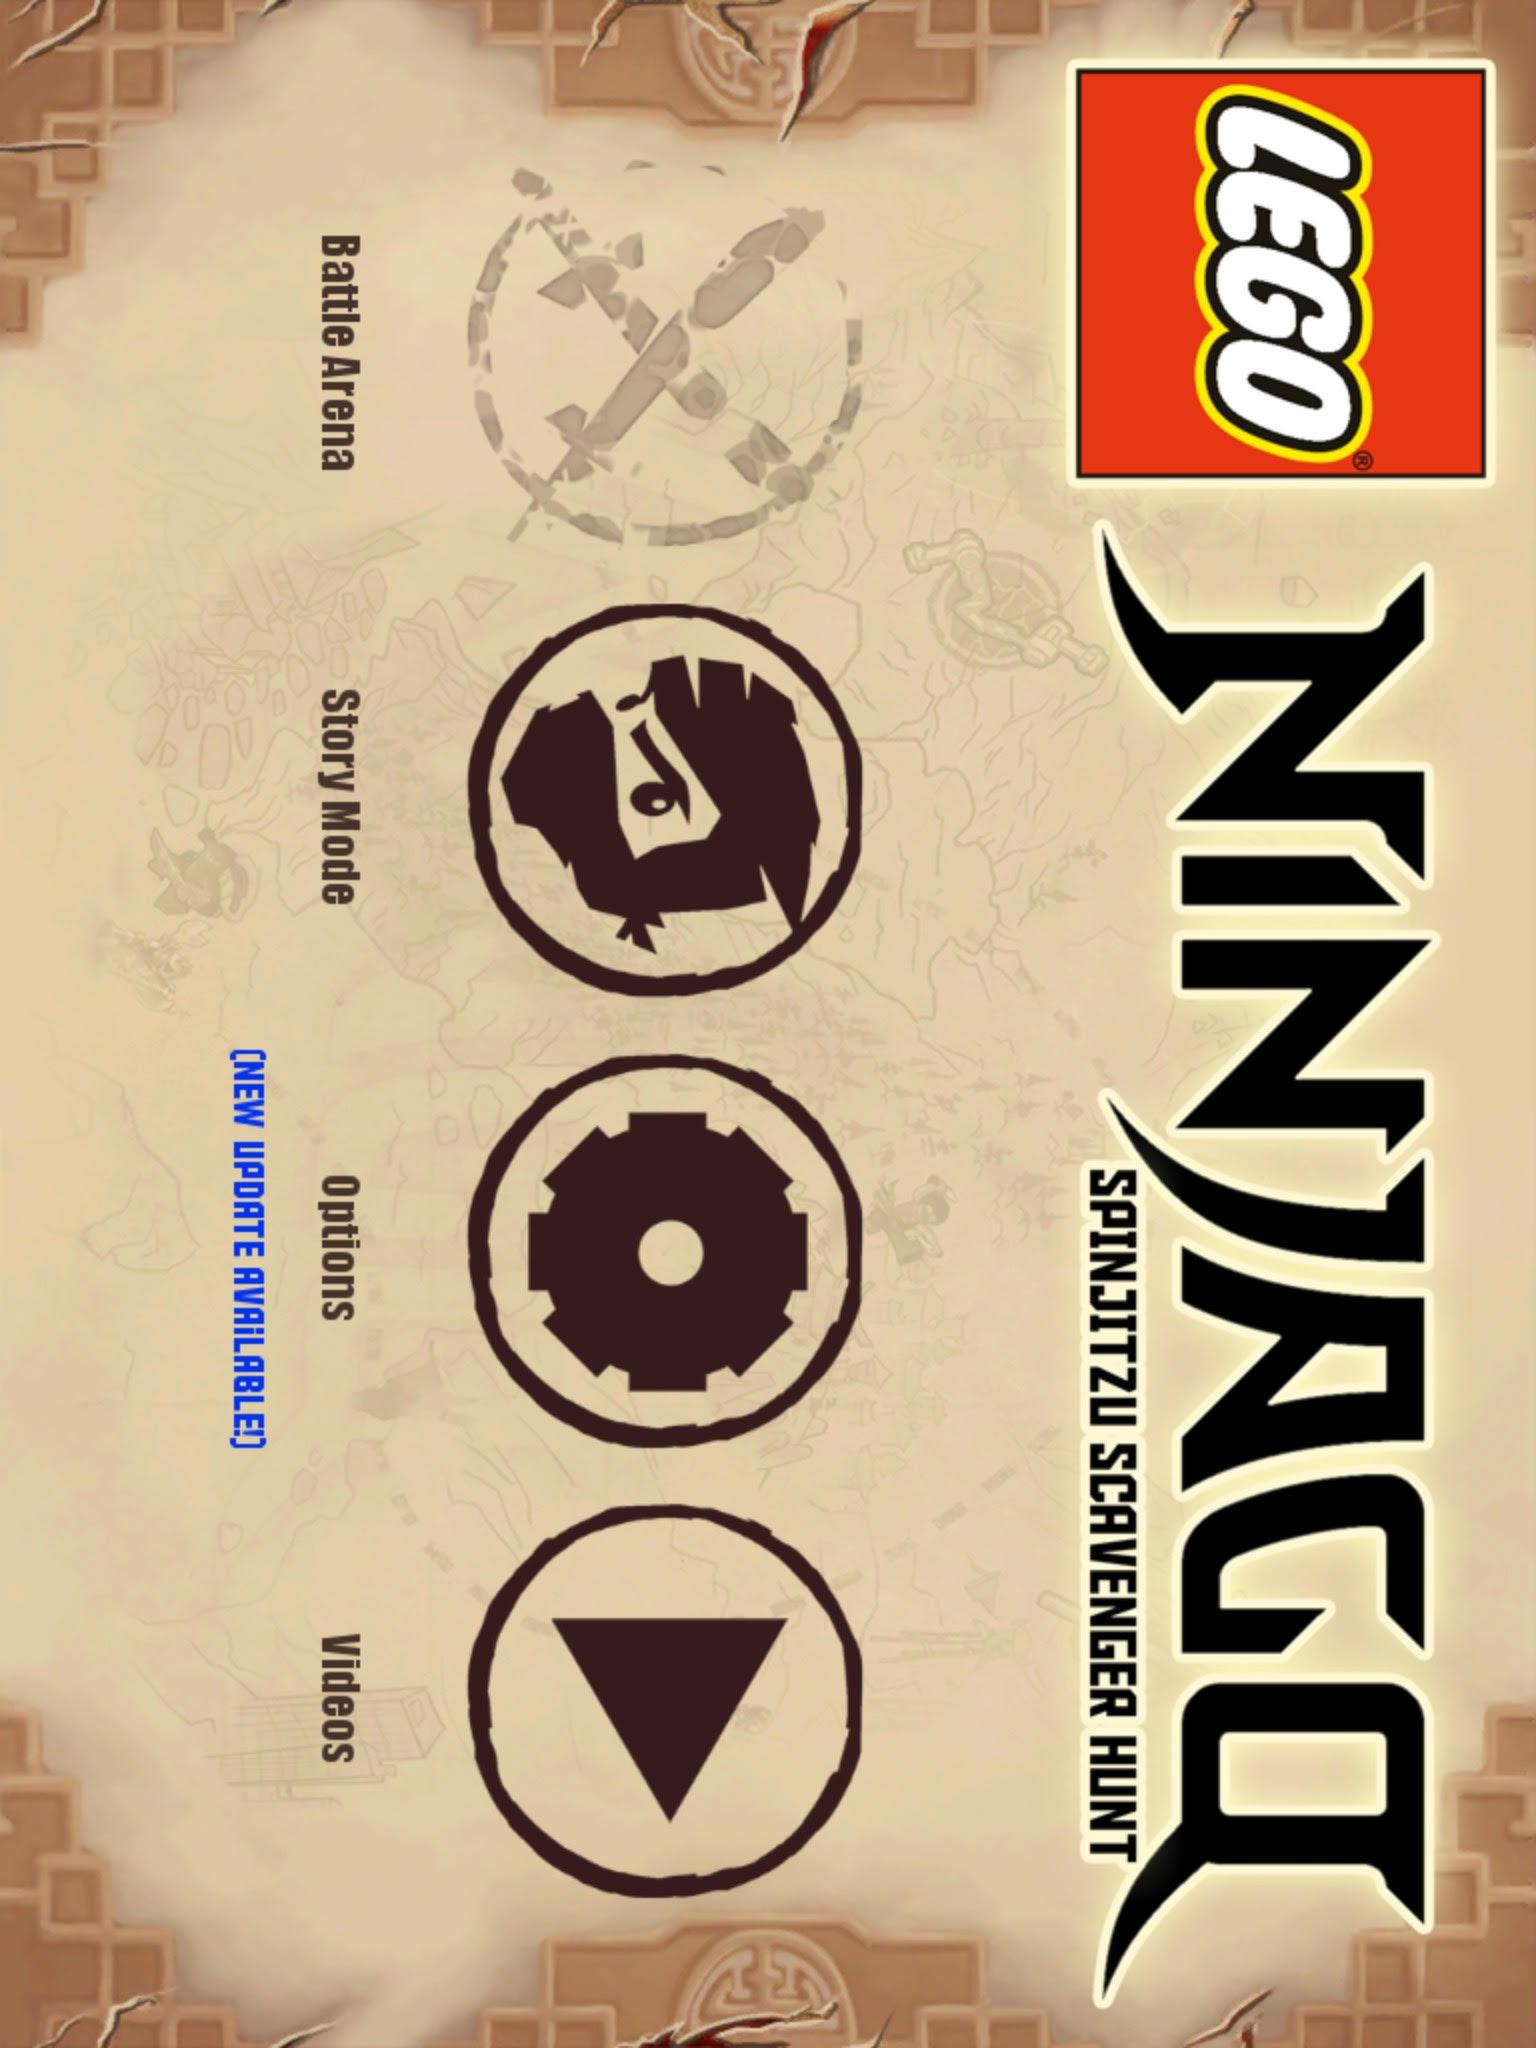 LEGO Ninjago: Spinjitzu Scavenger Hunt (Lost 2011 mobile game)